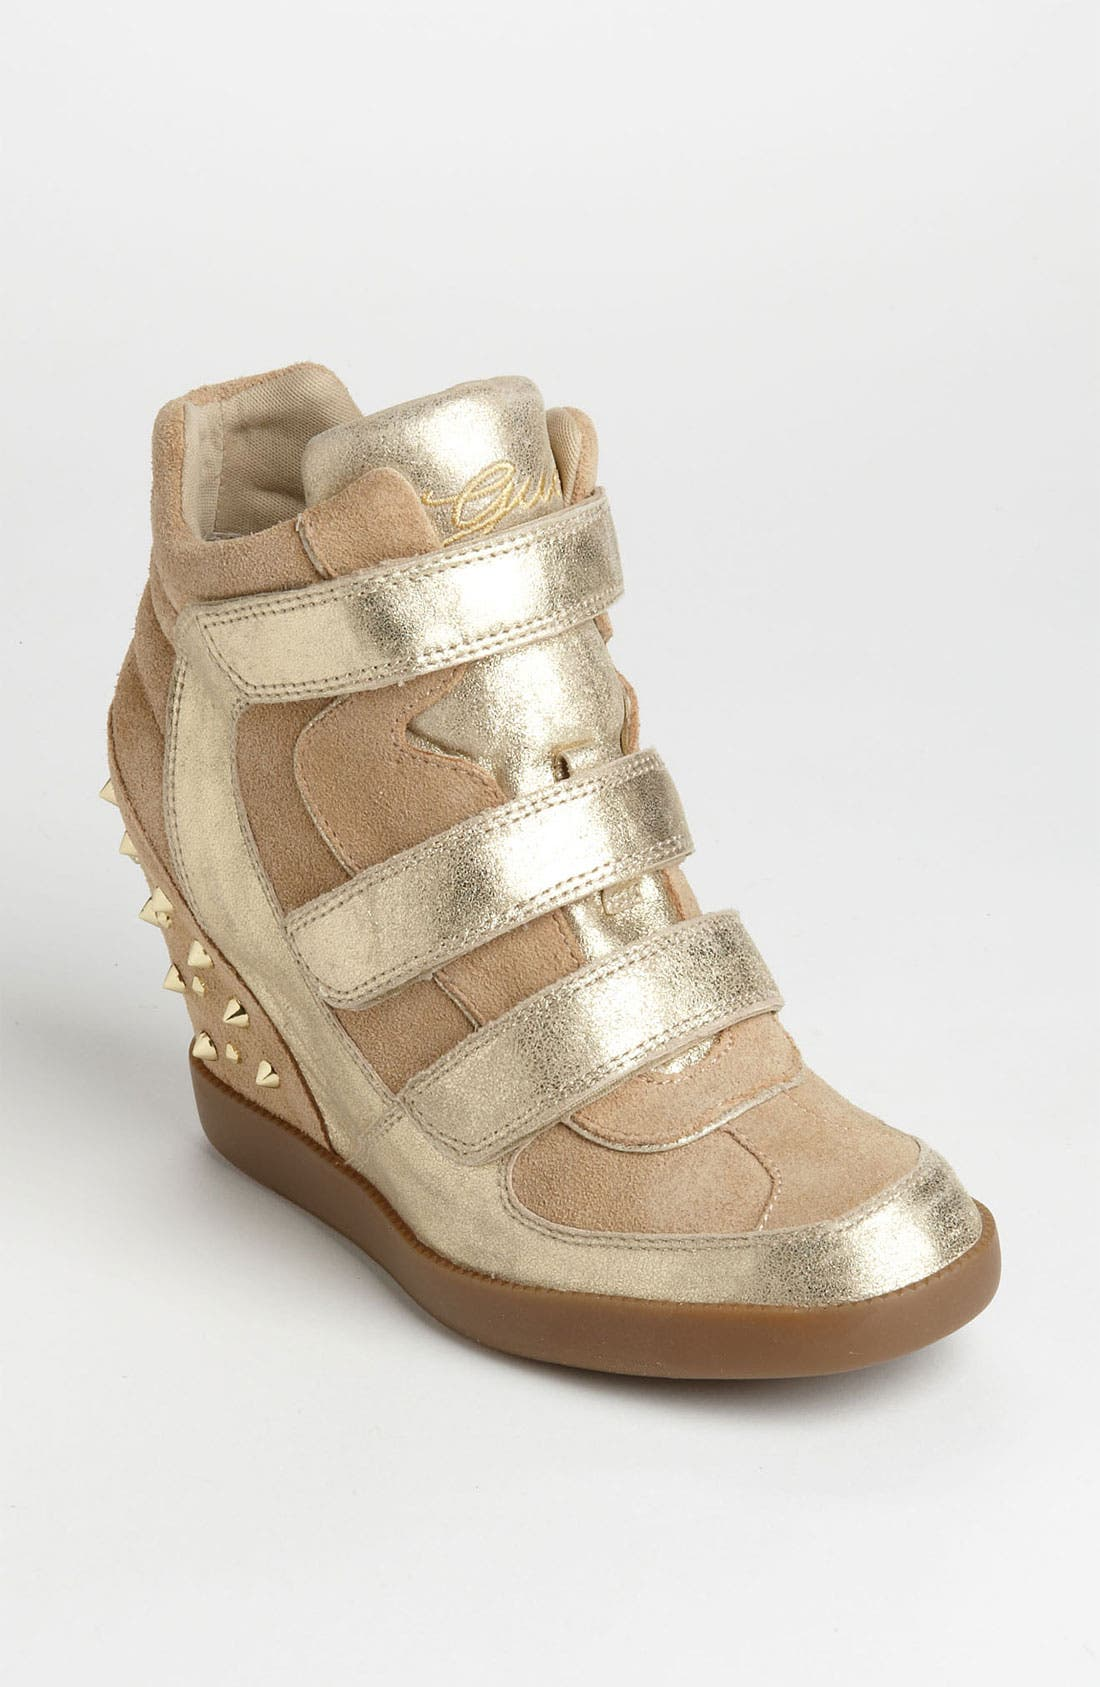 Main Image - GUESS 'Hisalyn' Sneaker